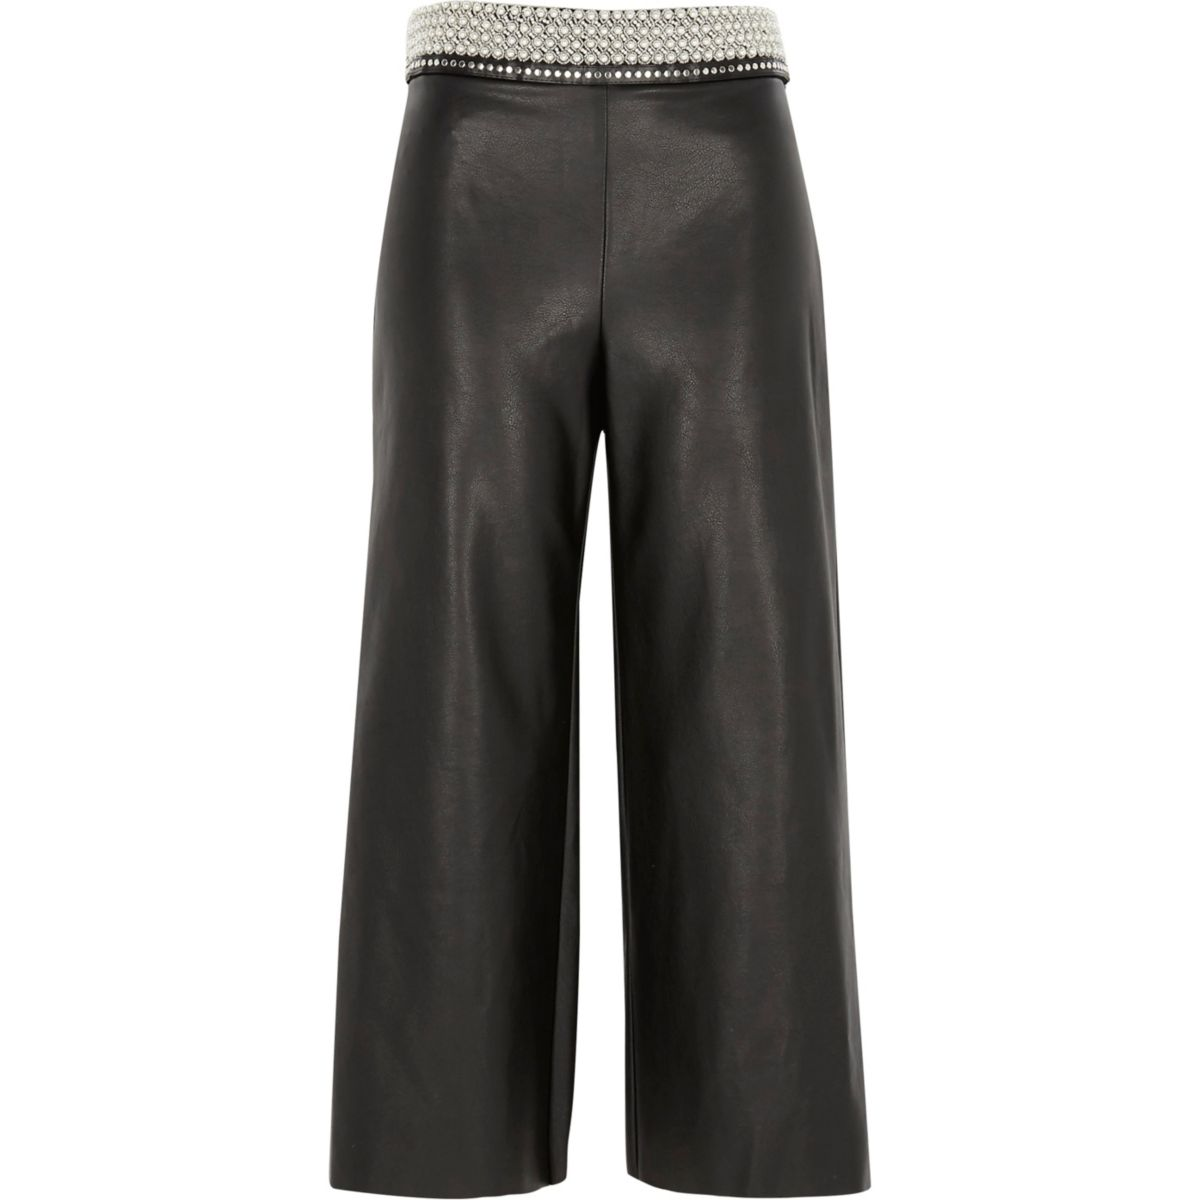 Schwarzer Hosenrock aus Lederimitat